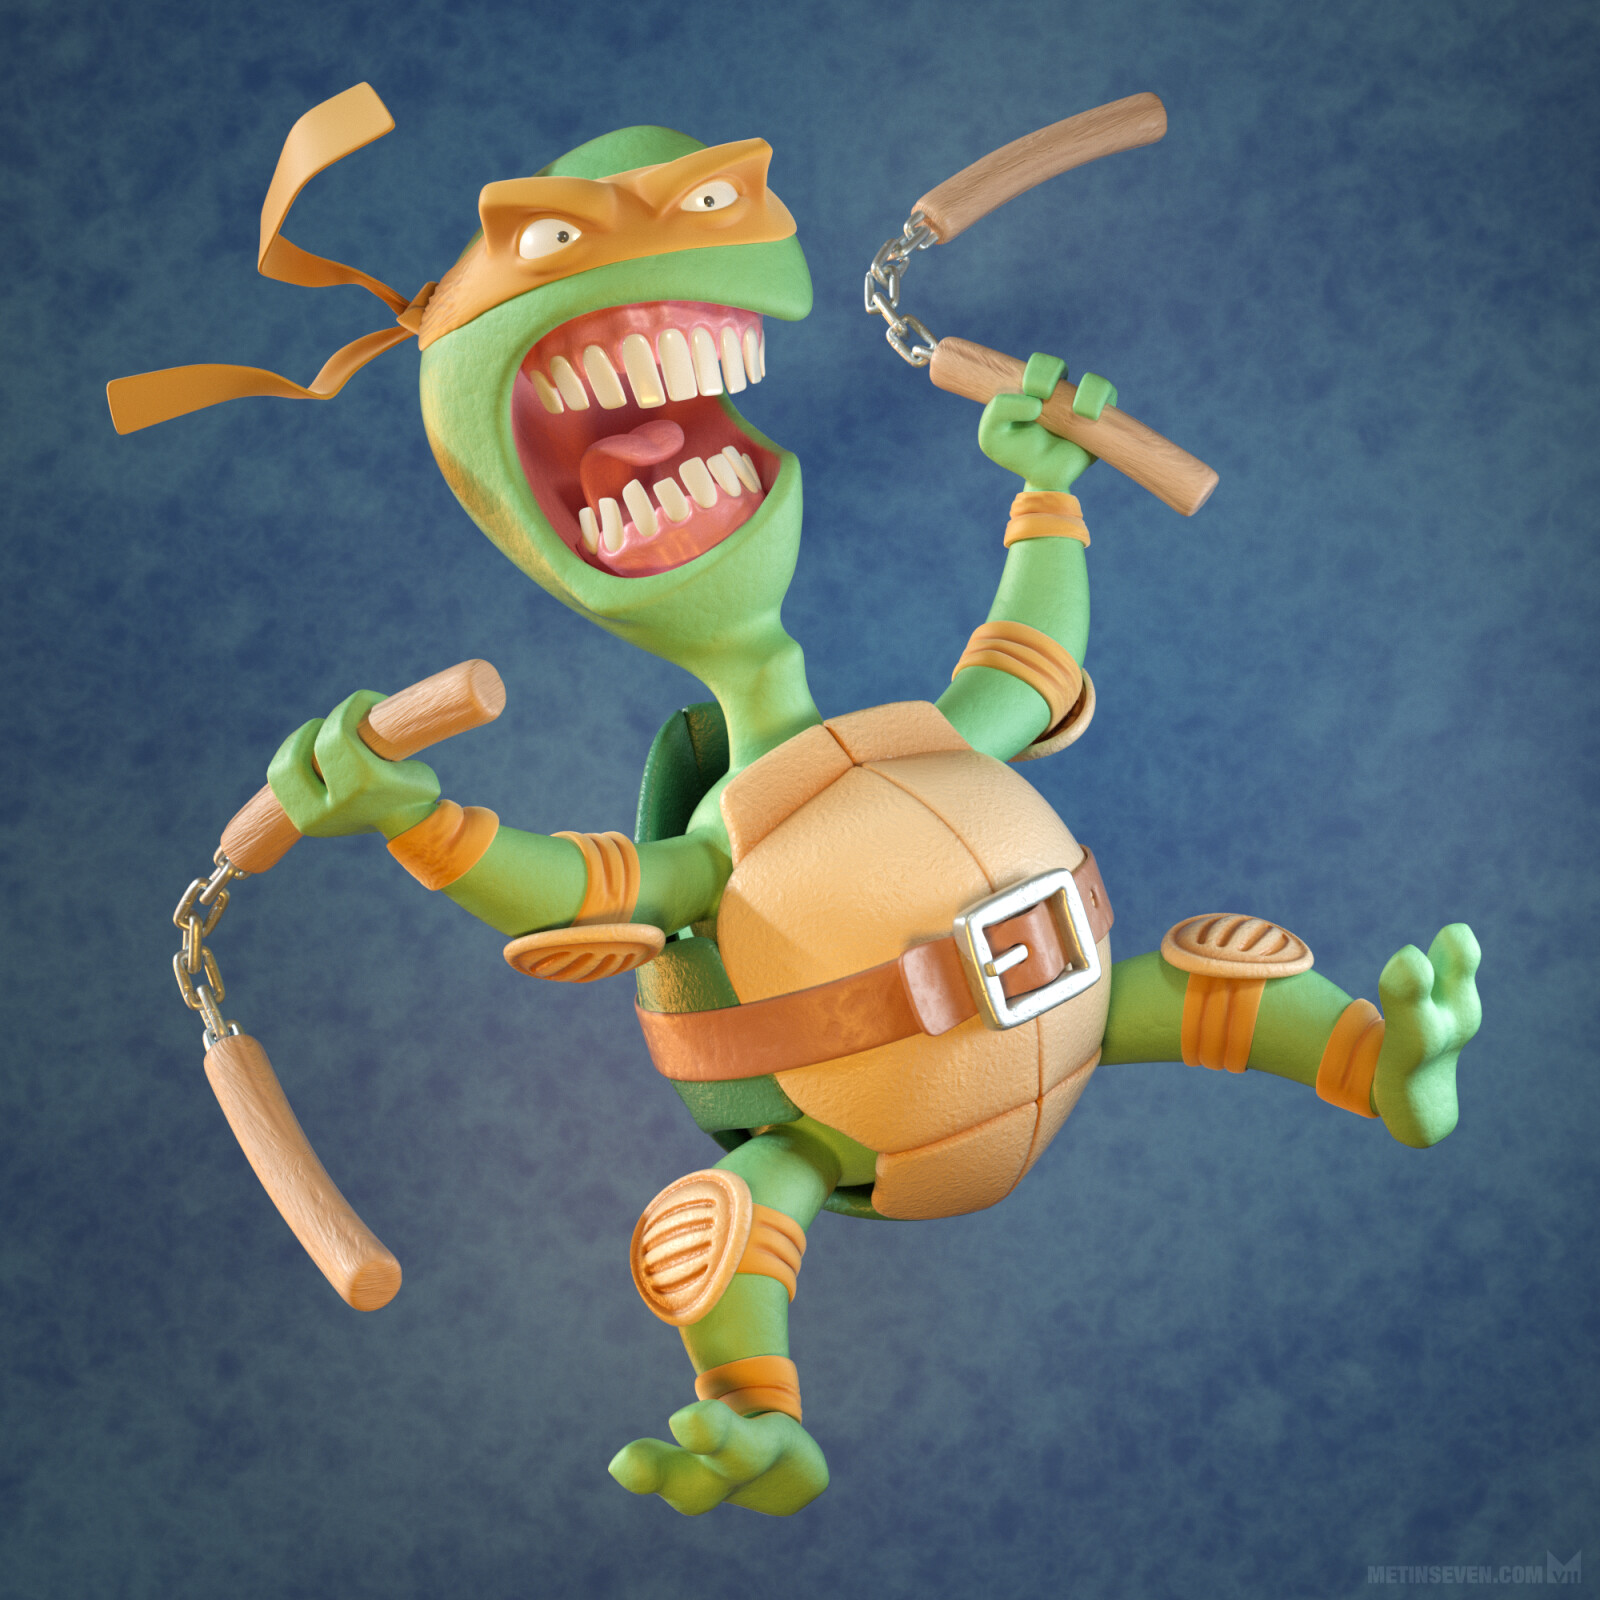 Cowabunga! 🐢 | Tribute to the Teenage Mutant Ninja Turtles, based on a sketch by Kevin Keele